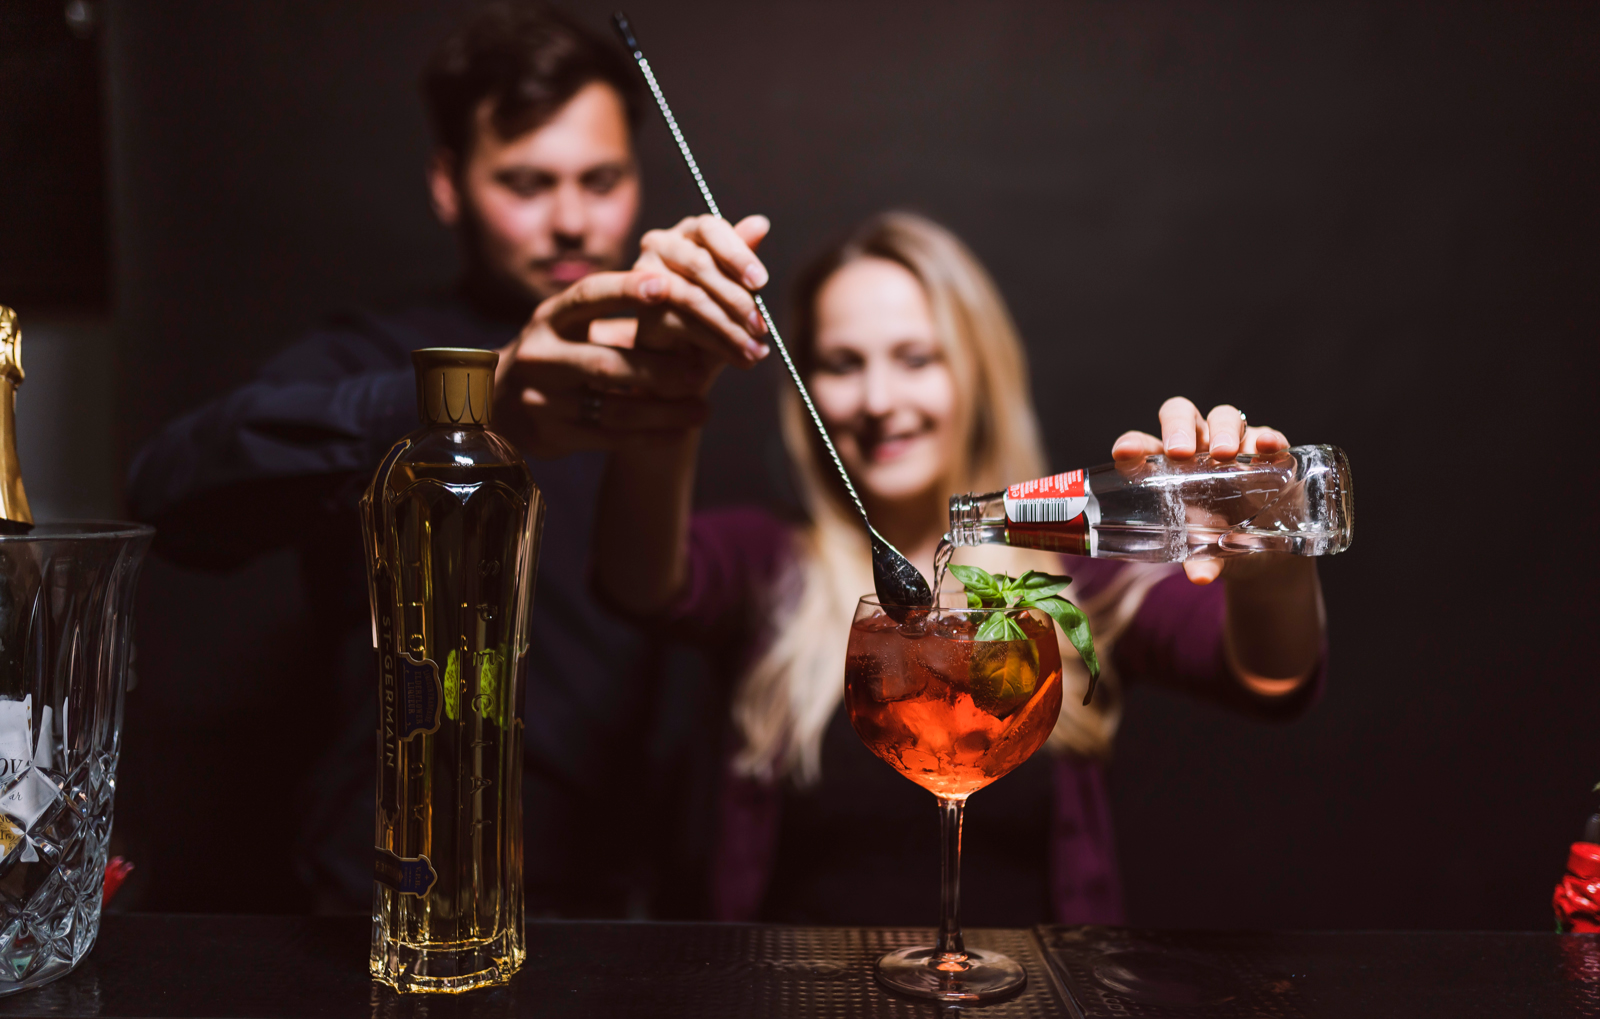 gin-tasting-freiburg-im-breisgau-bg3